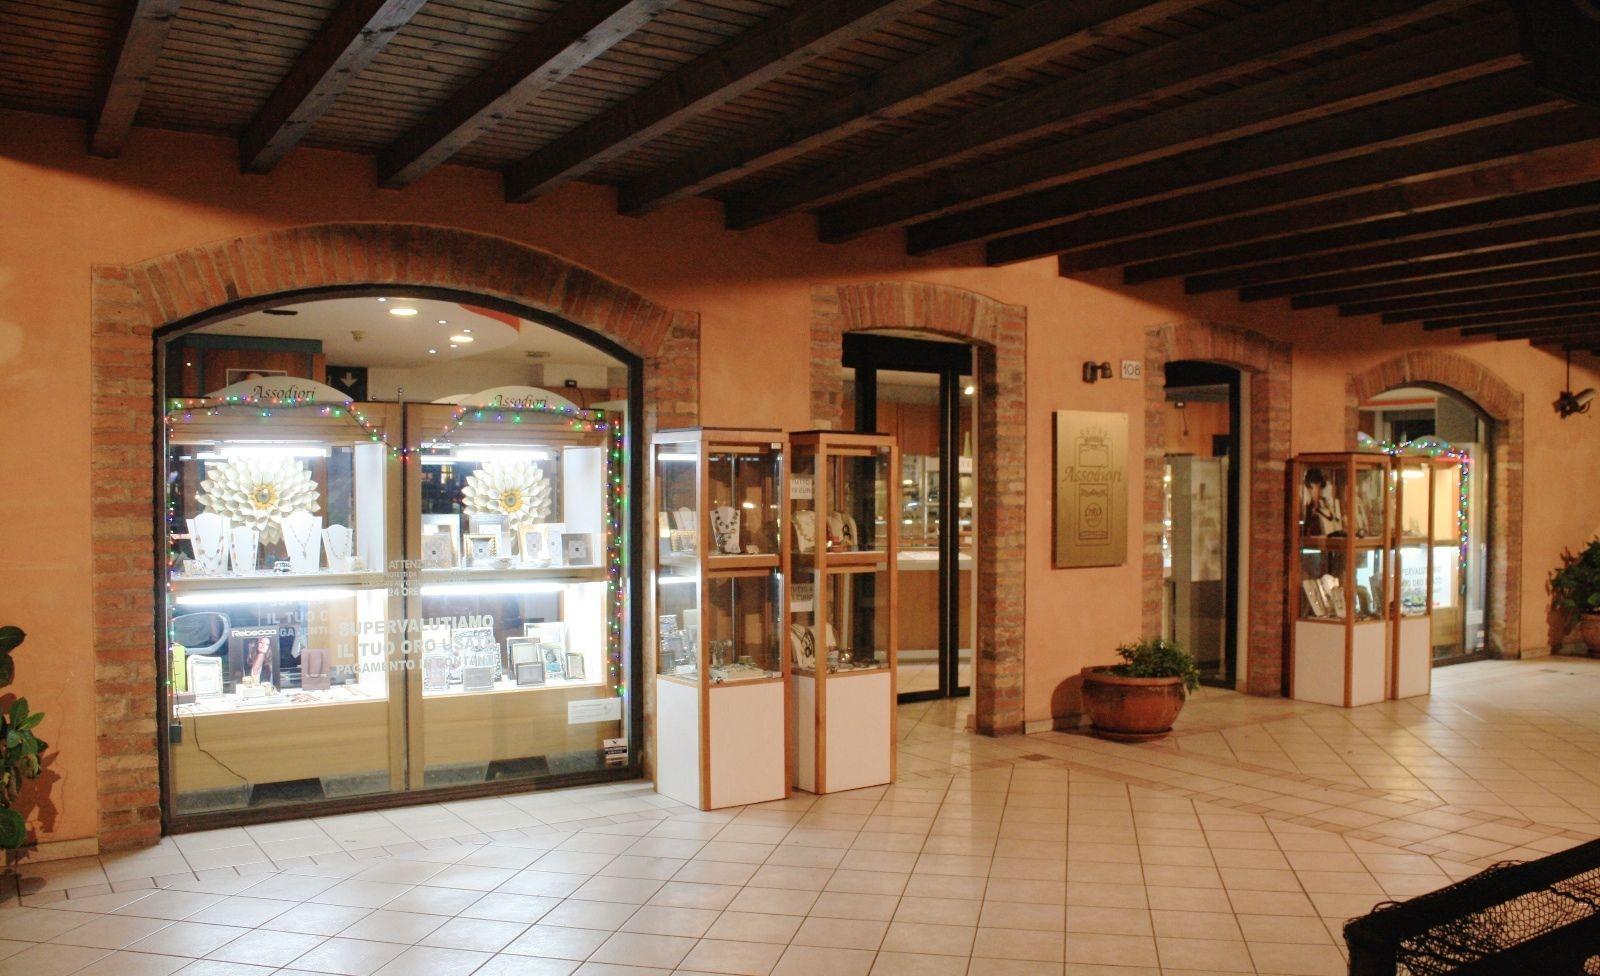 BRACCIALE ORO GIALLO O BIANCO 750 - 18K, 19 CM, 3 MM, MARINARA TRAVERSINO, ITALY